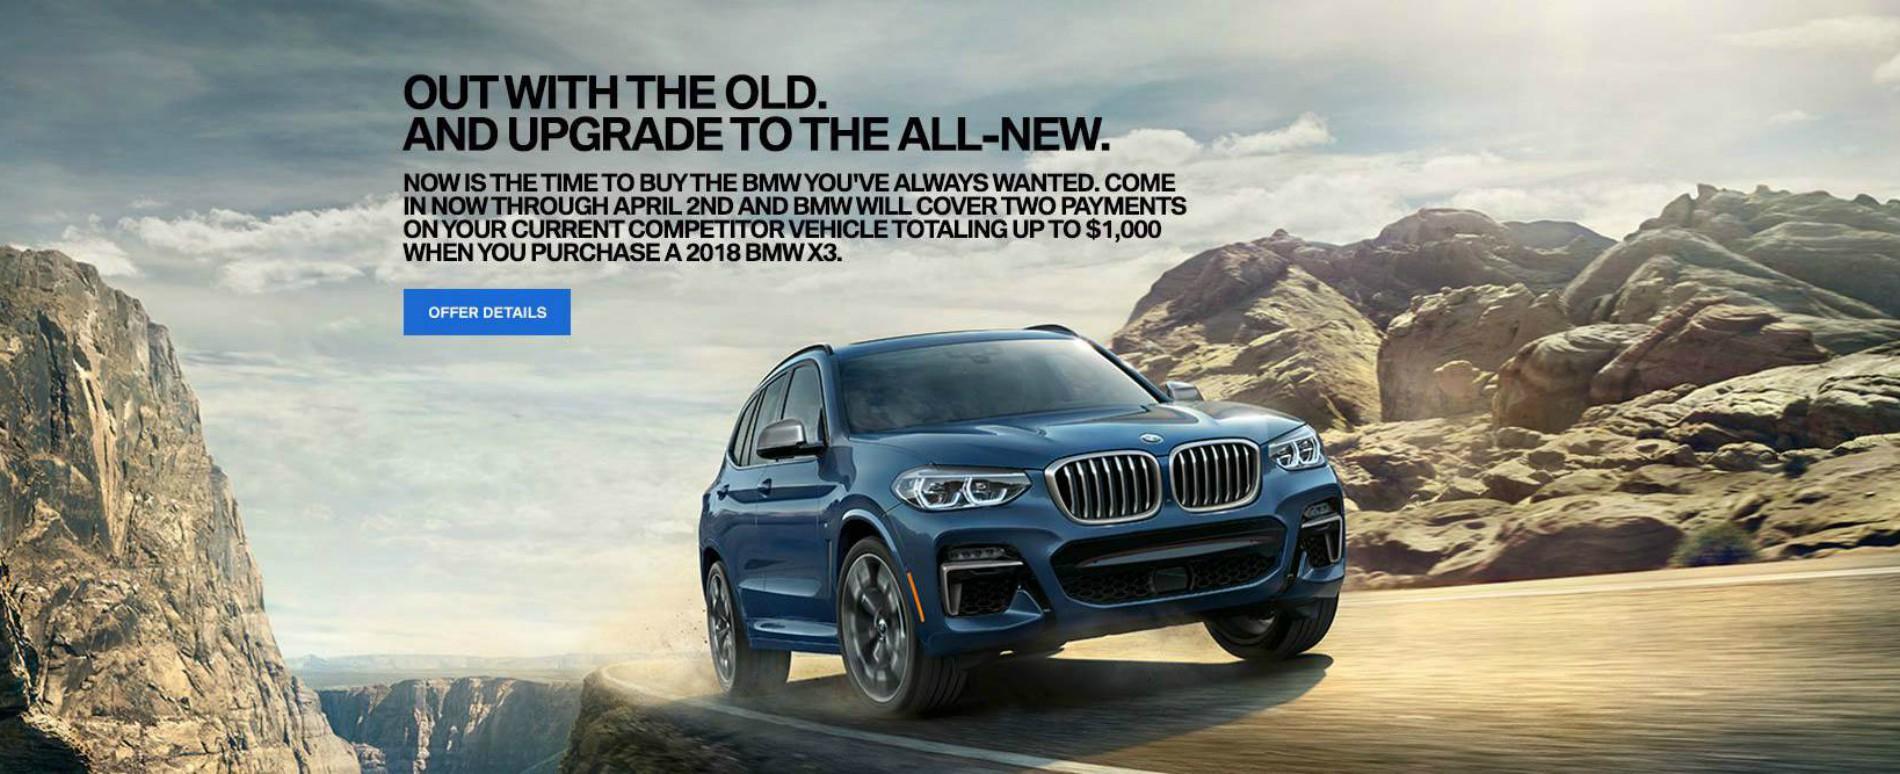 Acura North Scottsdale >> BMW New and Used Car Dealer - Phoenix, AZ | BMW North ...